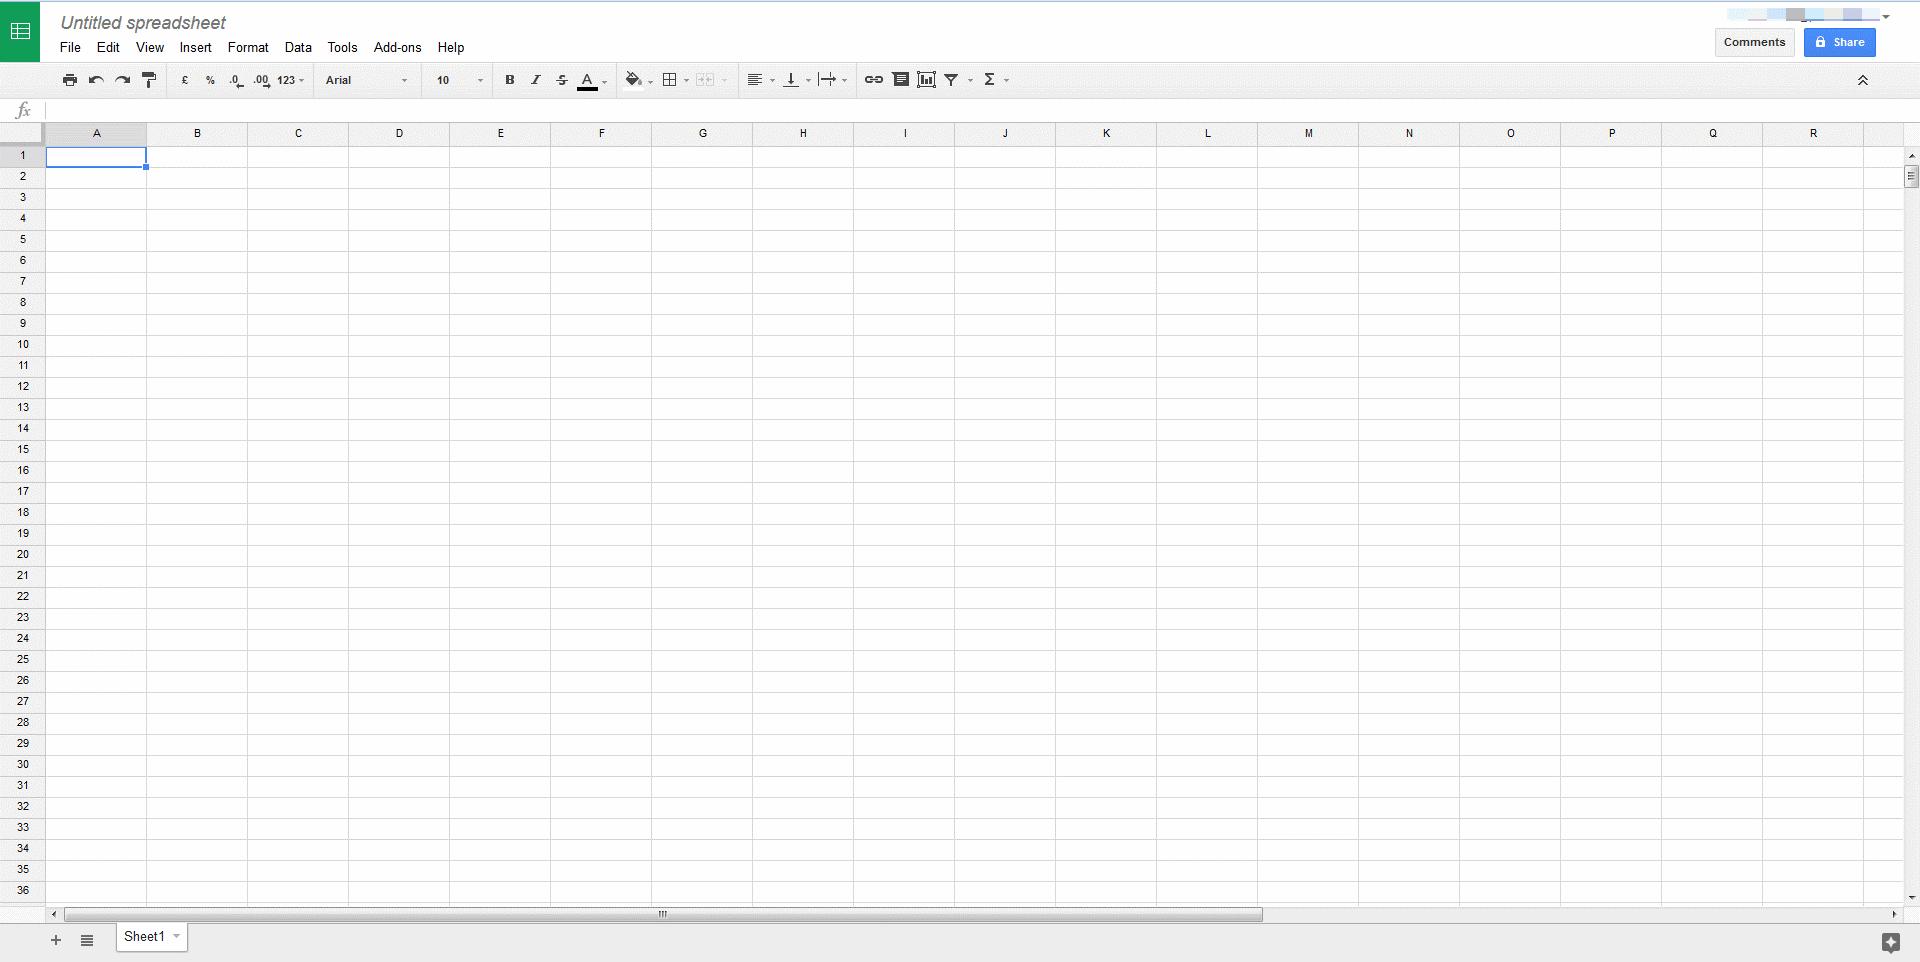 Free Microsoft Excel alternatives - 1&1 IONOS